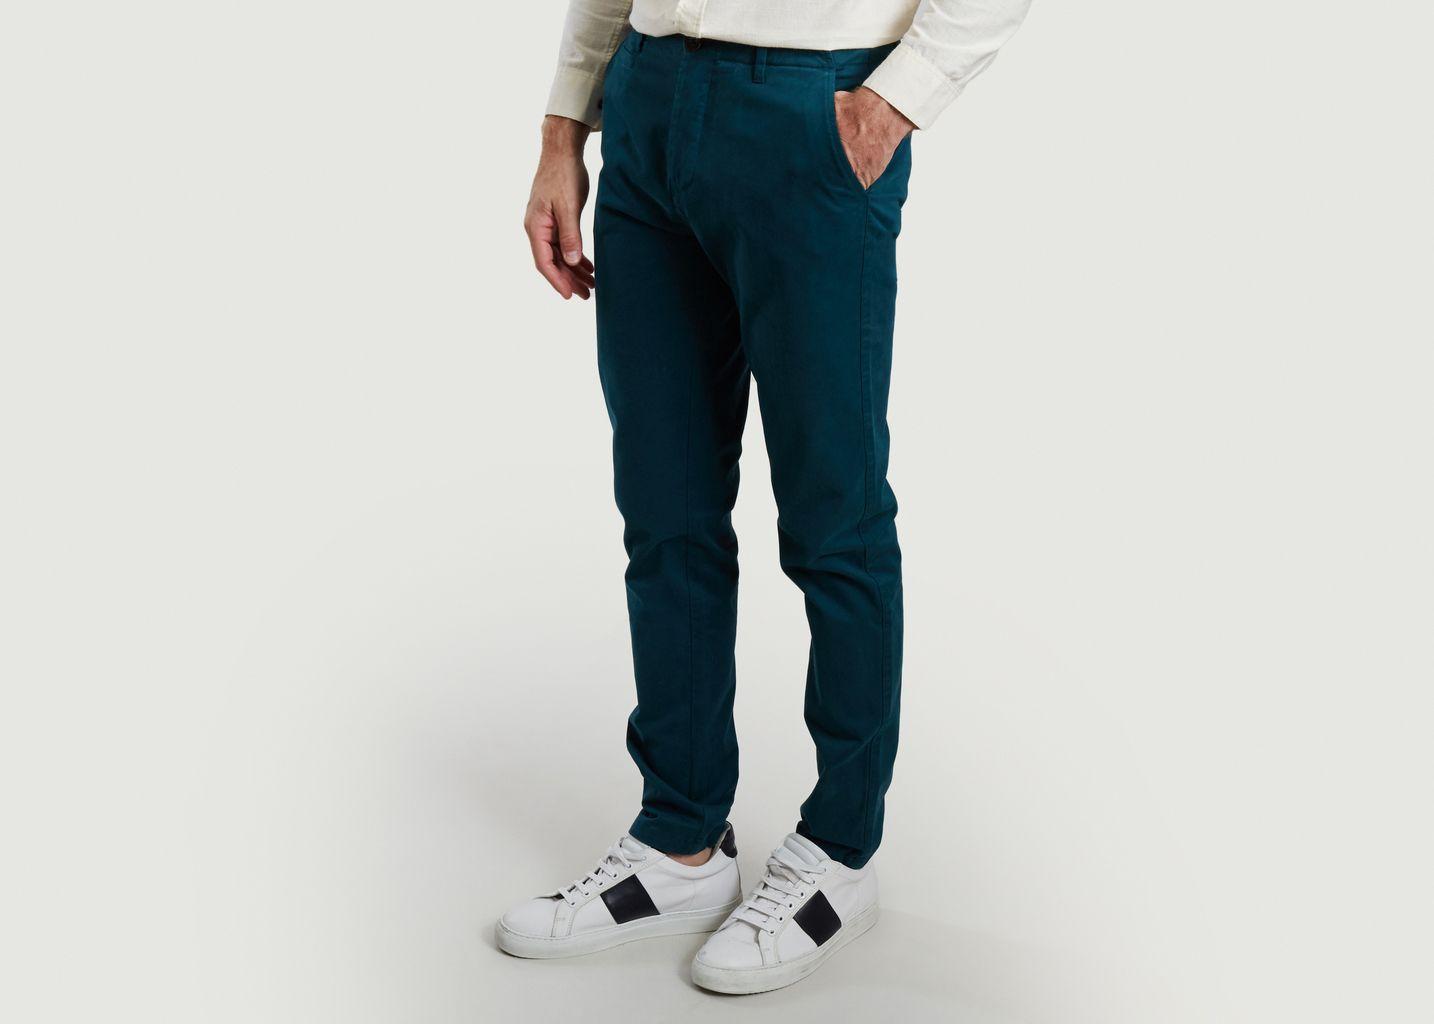 Pantalon Chino Classic en coton bio - Cuisse de Grenouille